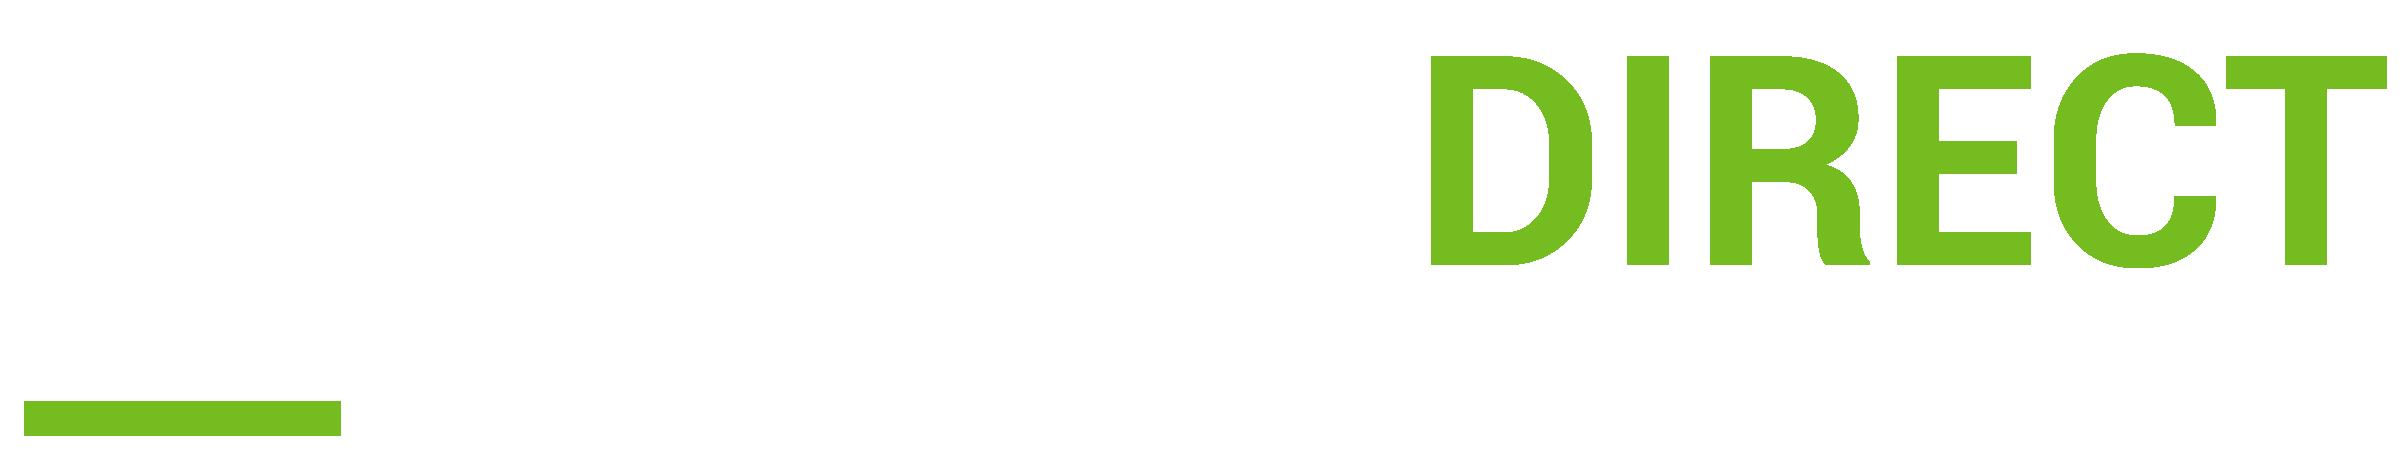 Wellsite_Direct_Website_Images_Wellsite Direct Logo